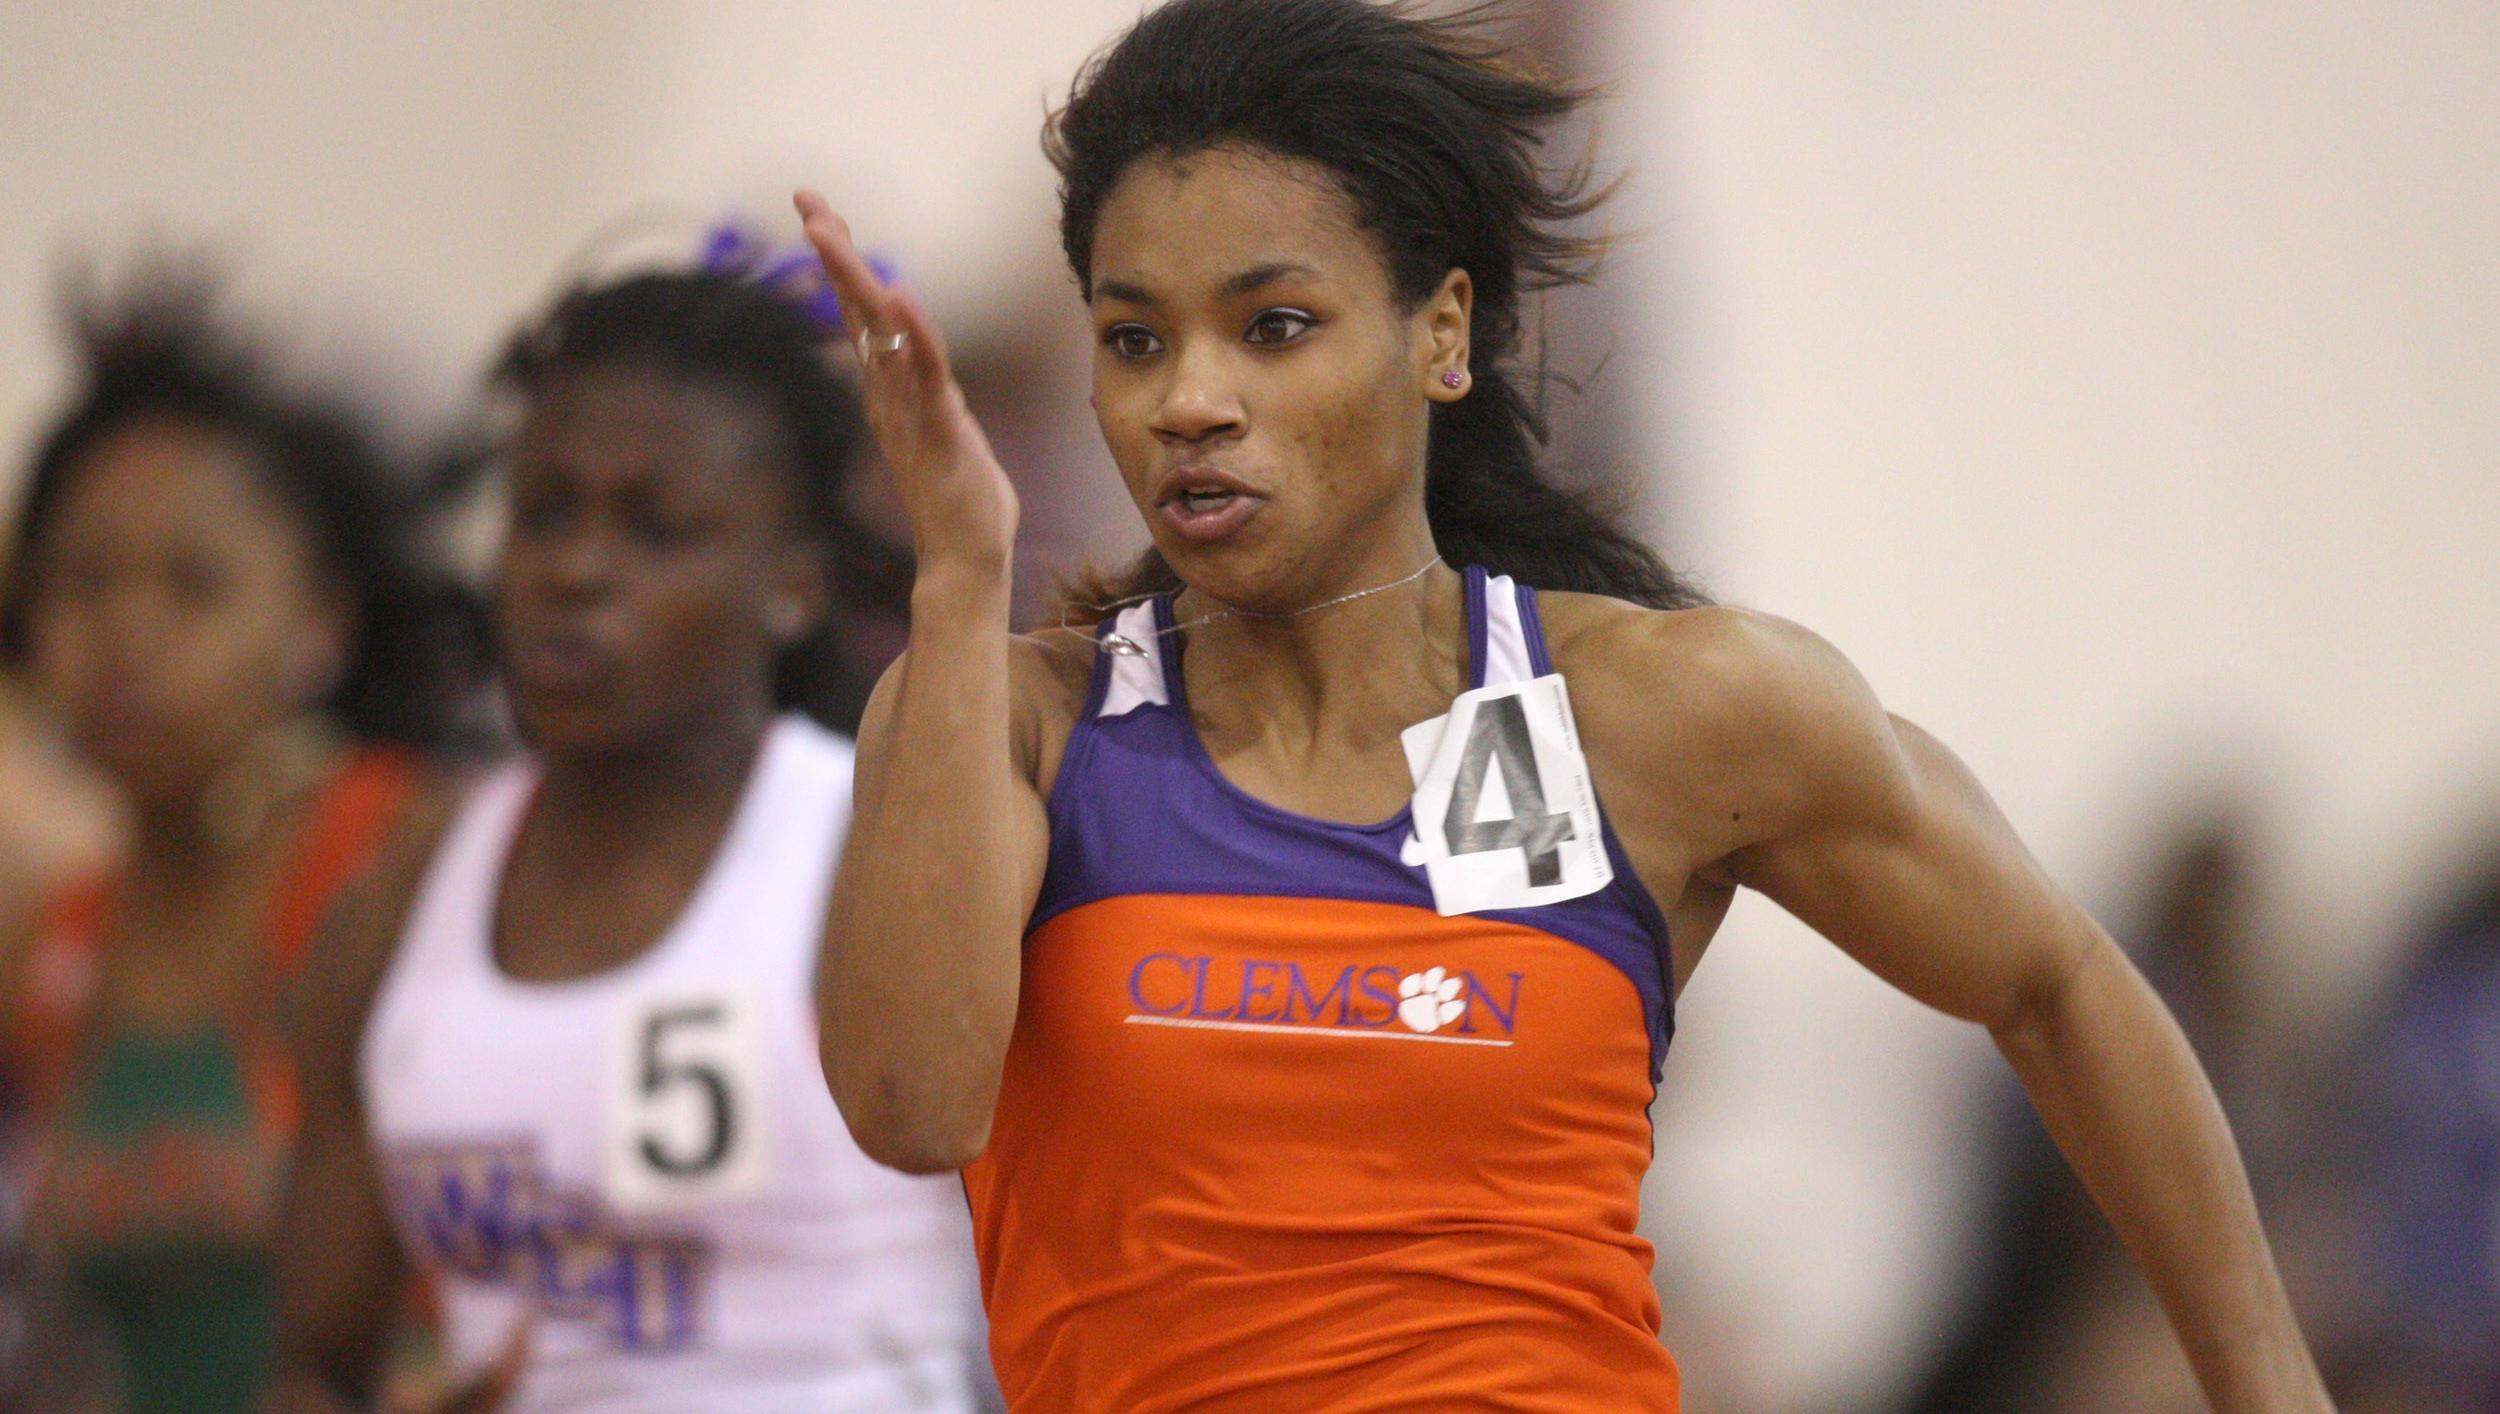 Clemson Women Retain Top Spot in USTFCCCA National Rankings